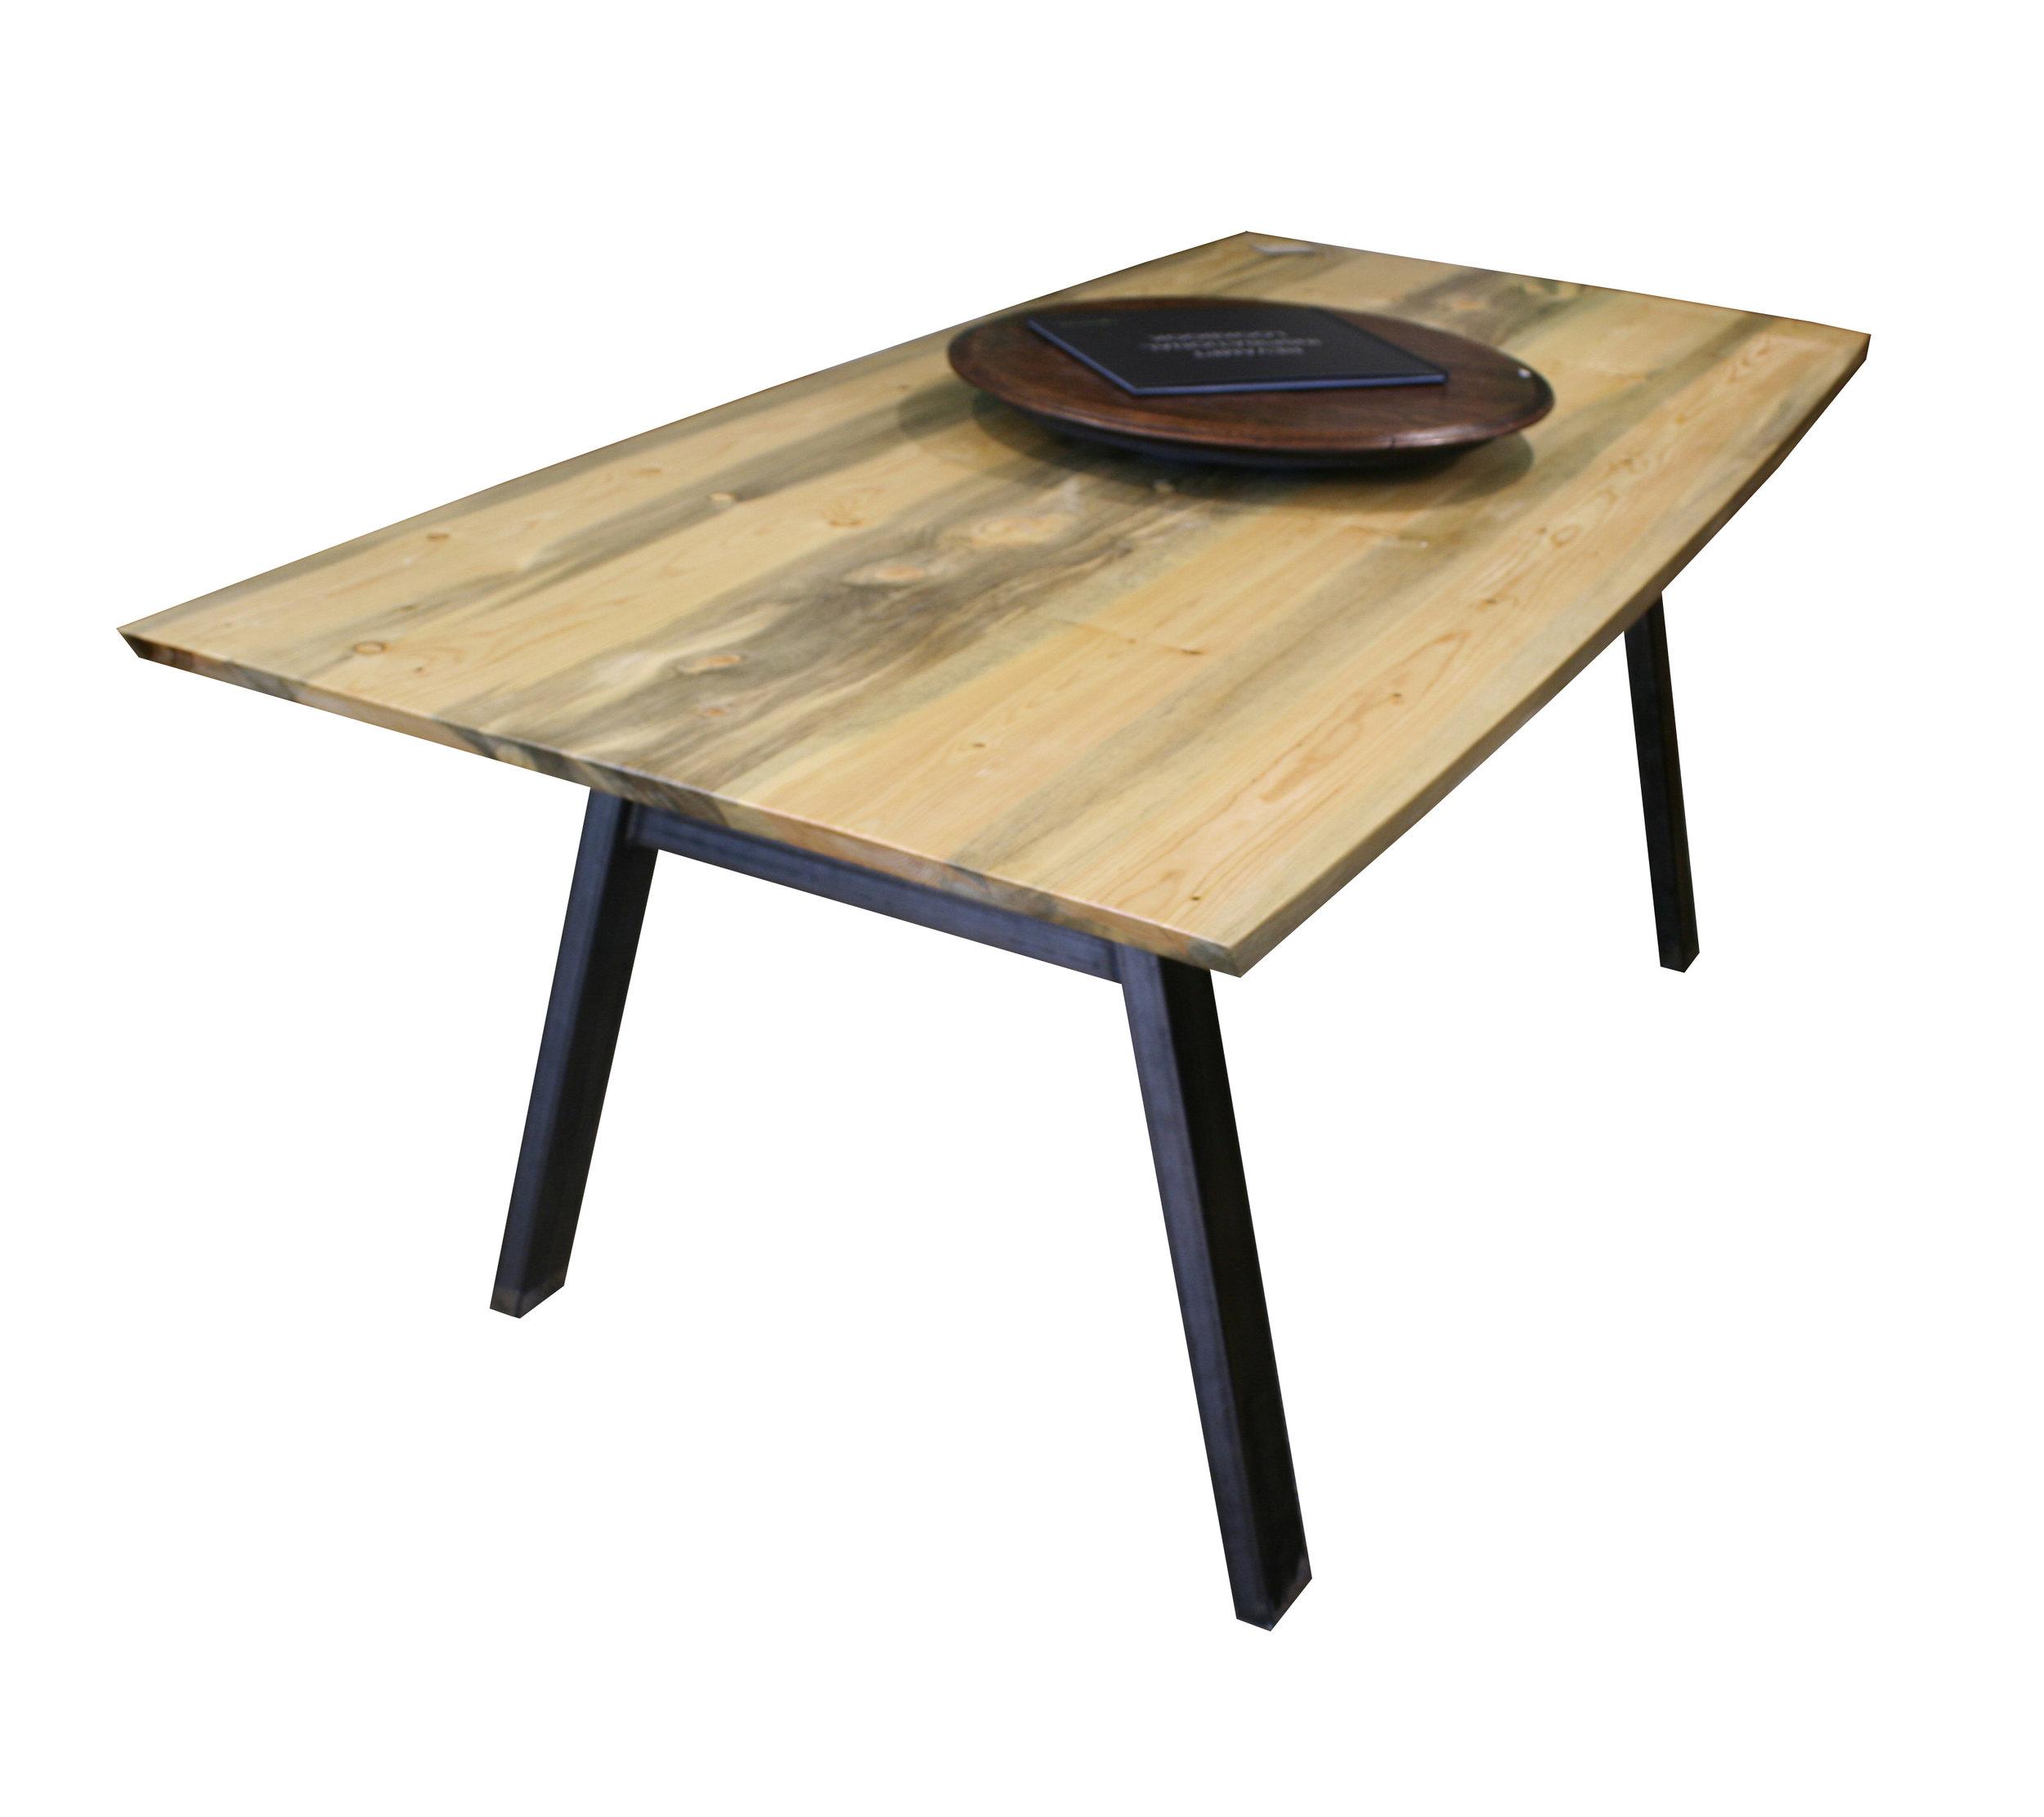 Curved Beetle Kill Angled Post Leg Dining Table.jpg